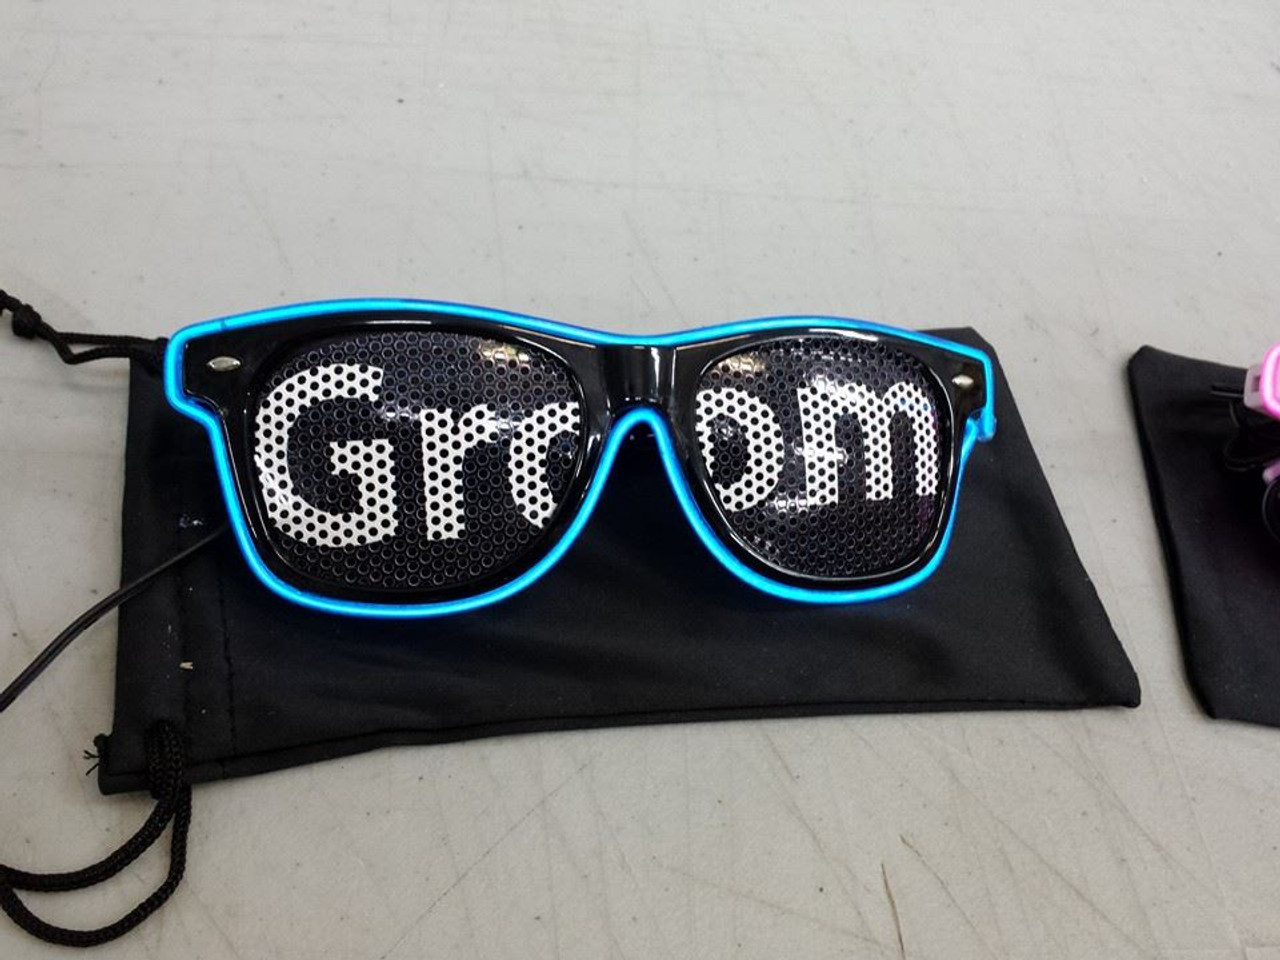 LED, GLOW, NEON, Groom, Wedding, Shades, sun glasses